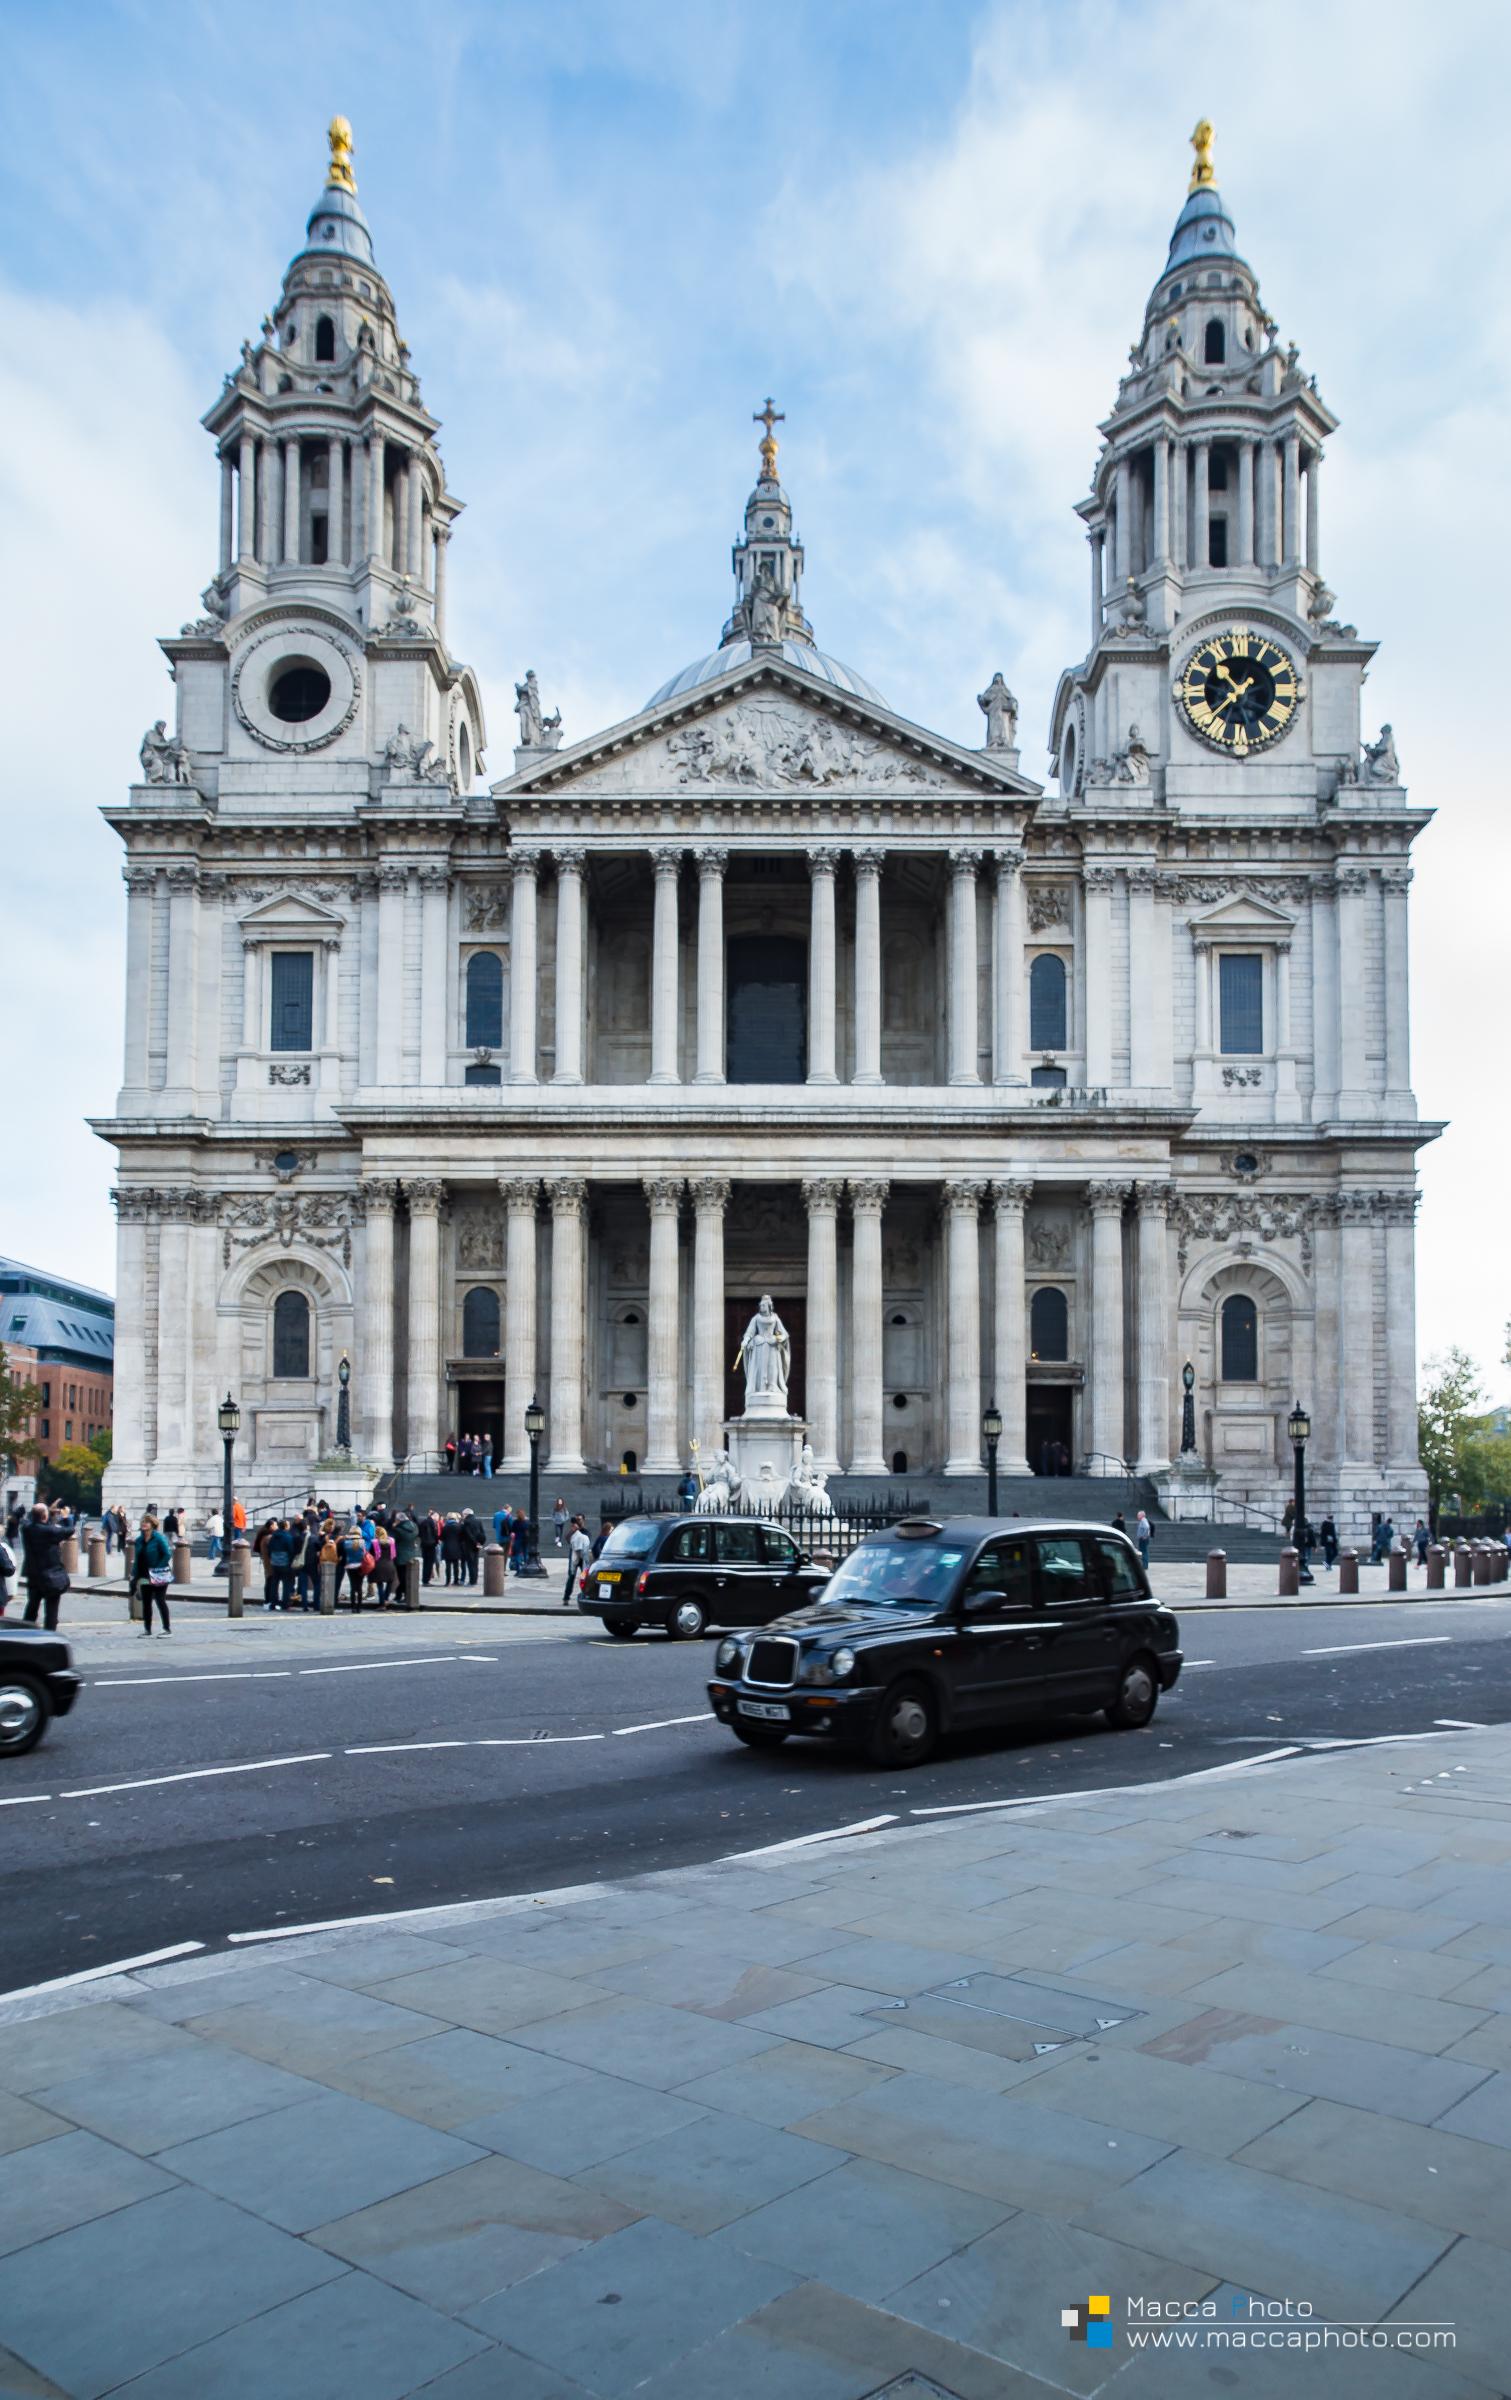 London - St Pauls 1